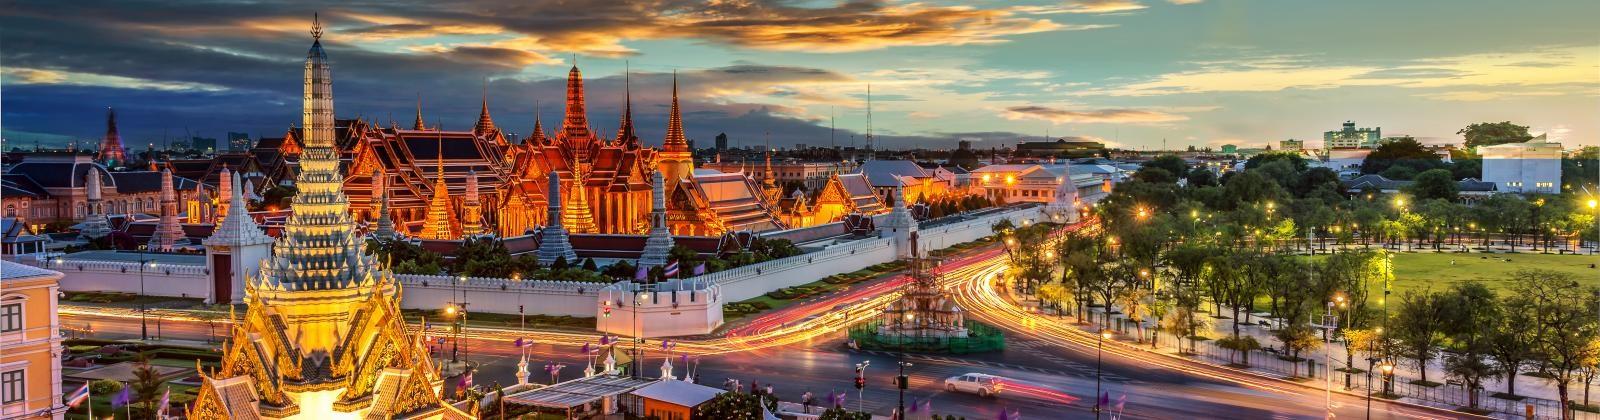 bangkok3 - La Thailandia regola gli investimenti: approvate Ethereum Classic e Stellar